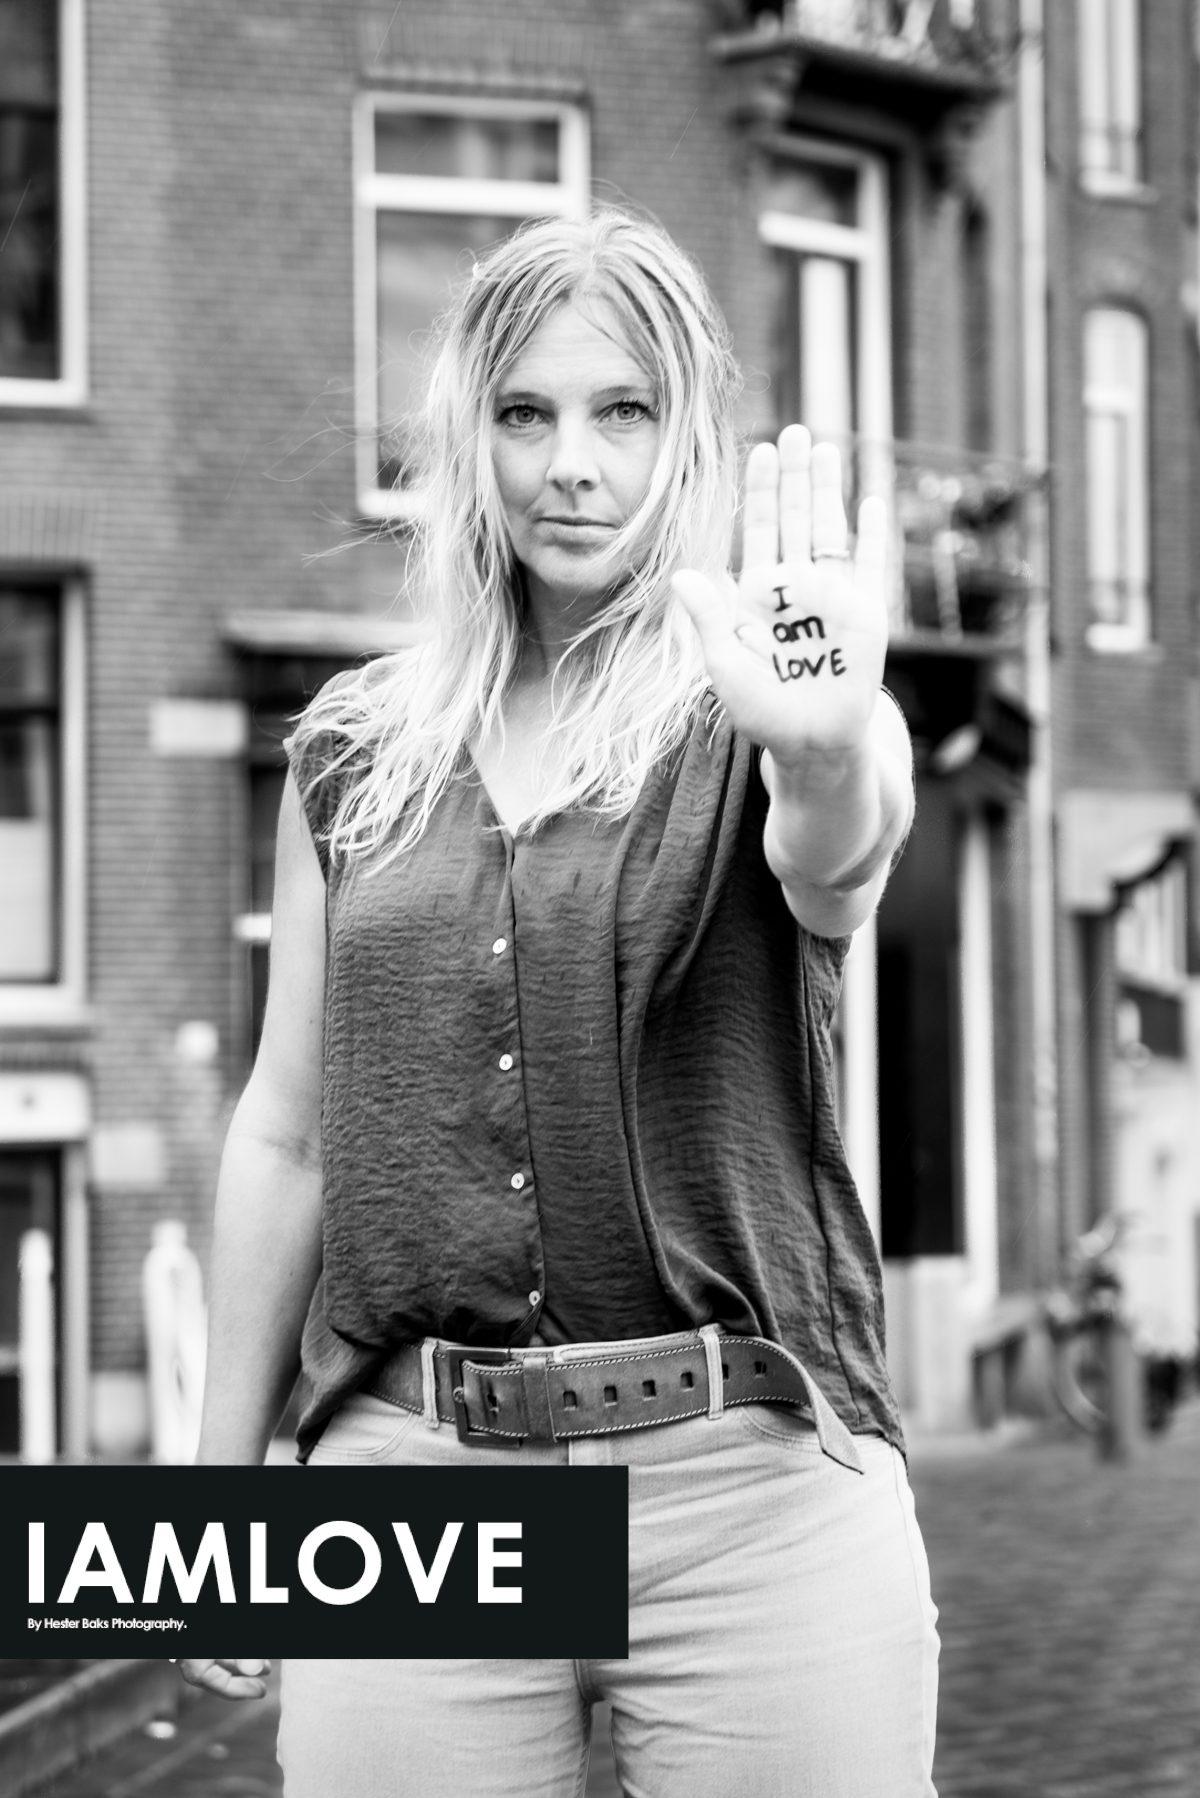 Sandra Konst portrayed by Hester Baks for I AM LOVE story photography